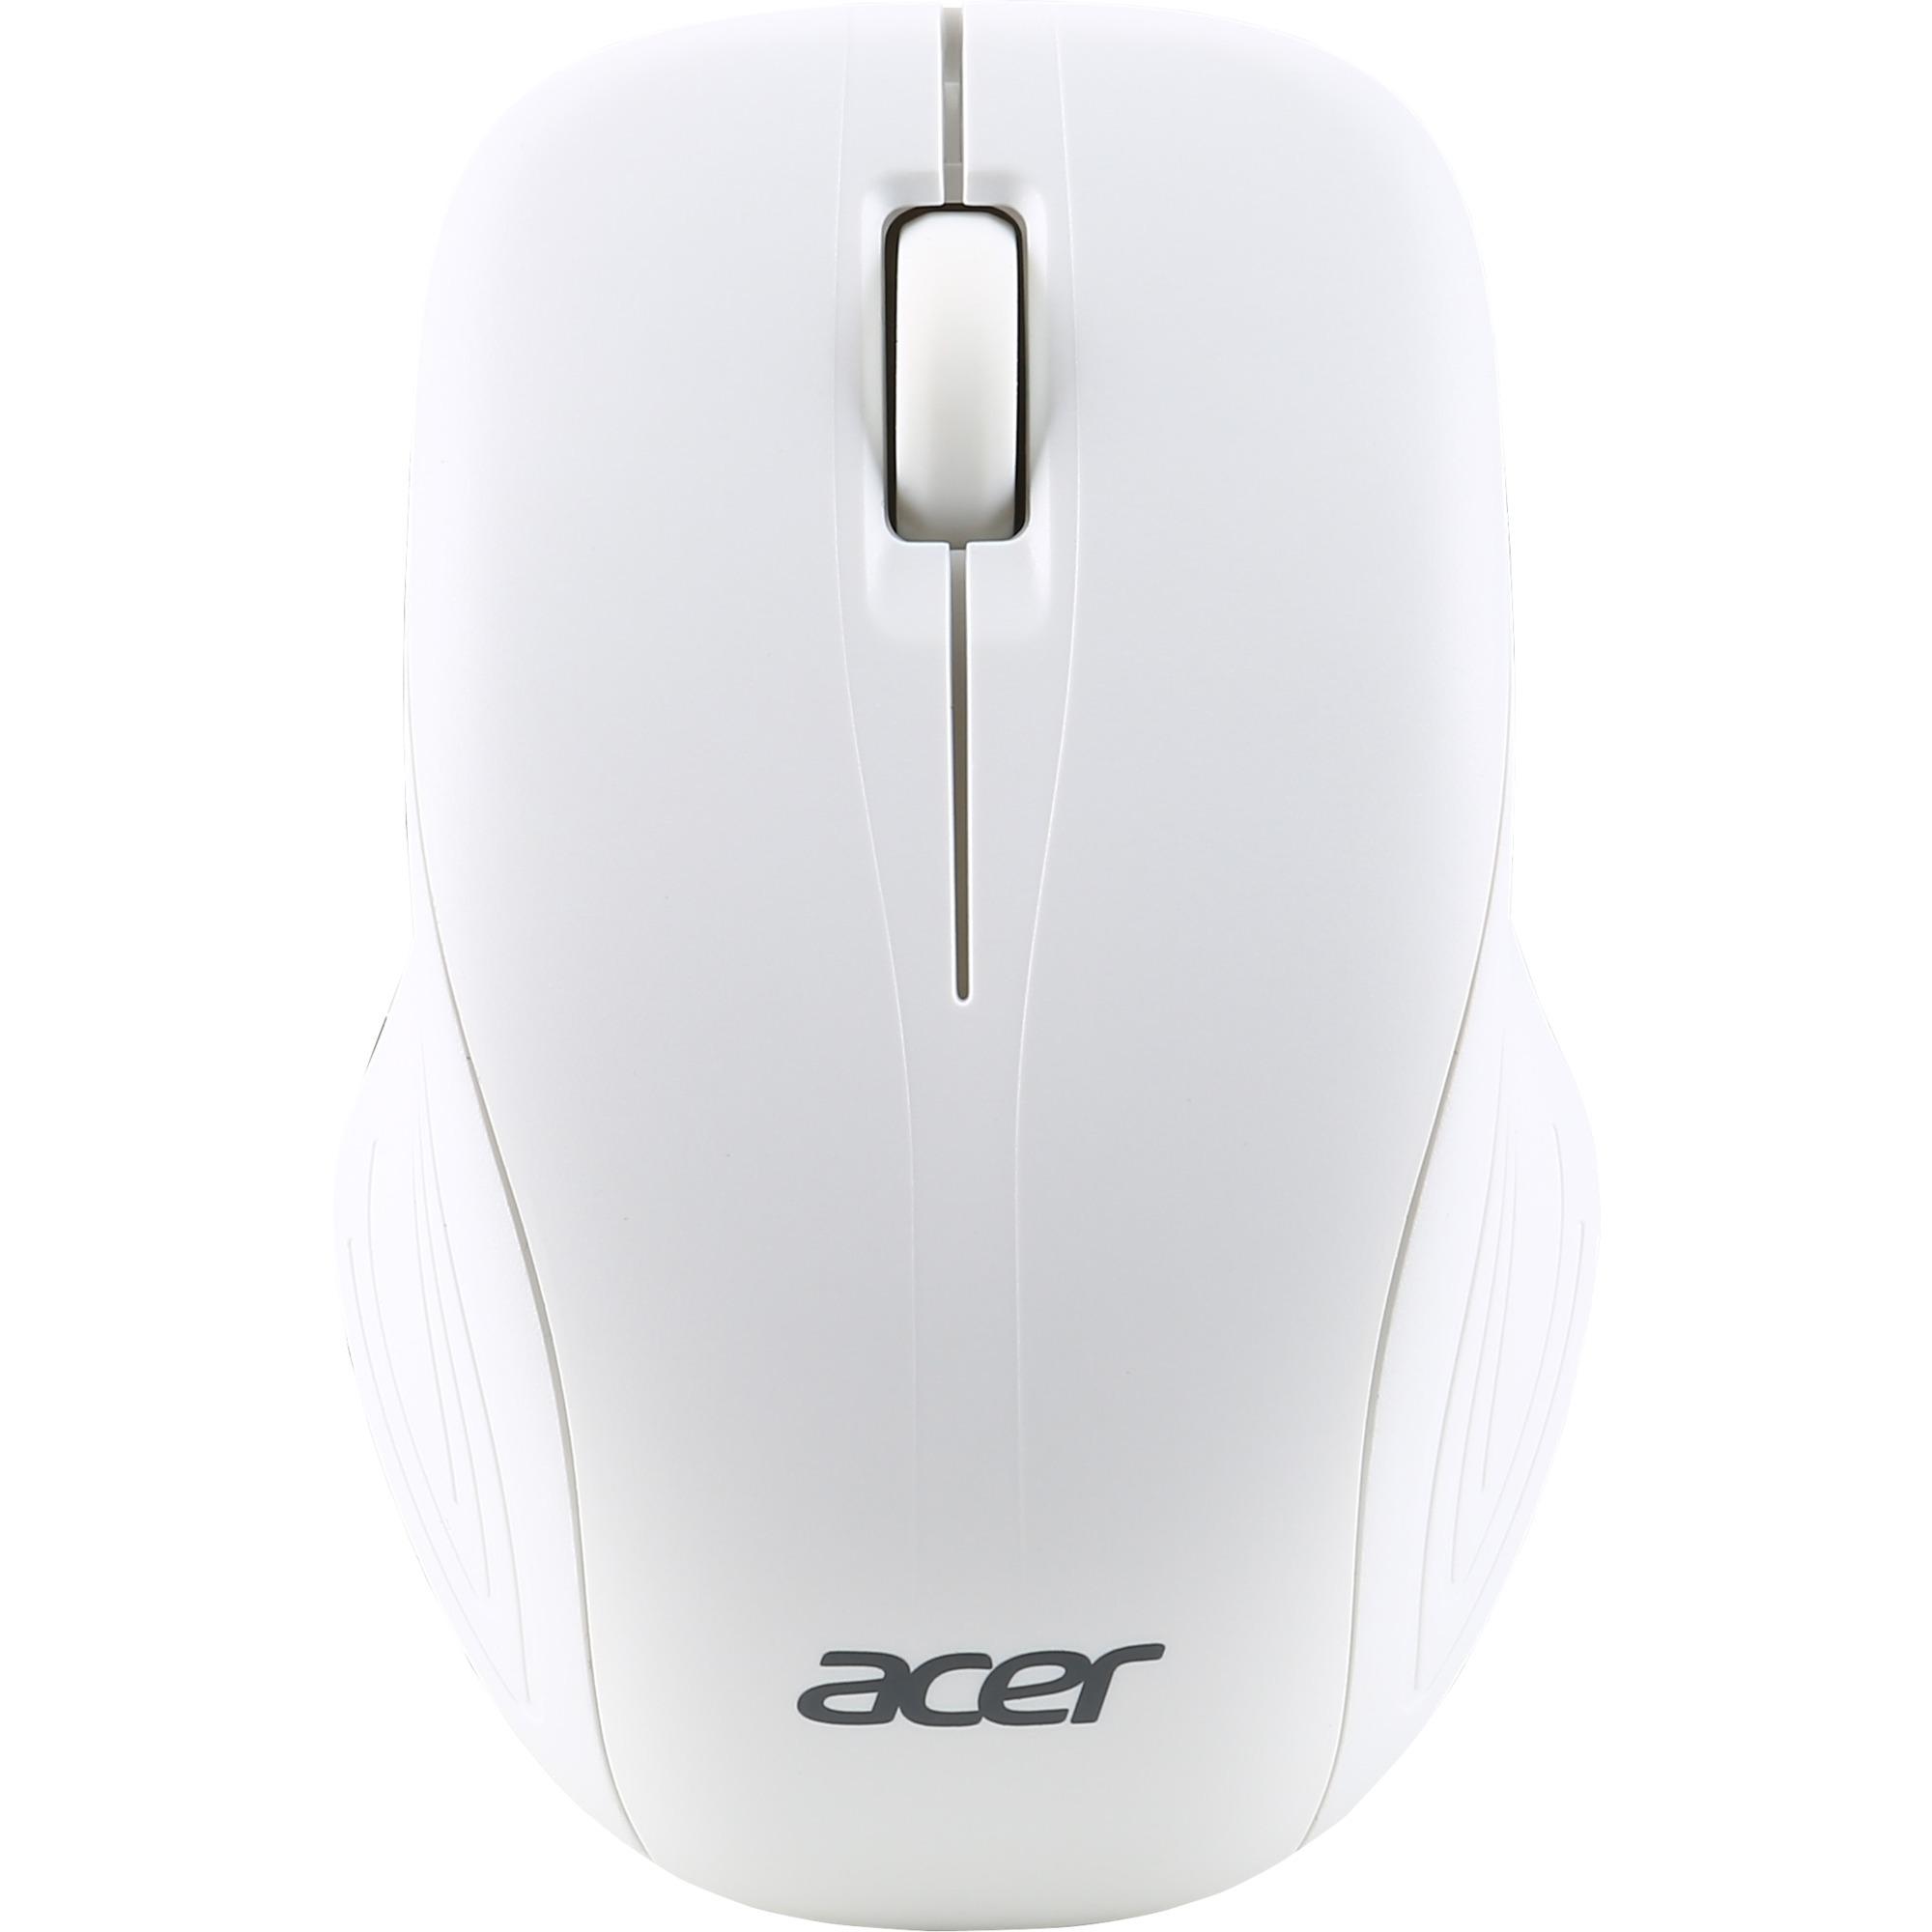 AMR510 ratón RF inalámbrico Óptico 1000 DPI Ambidextro Blanco